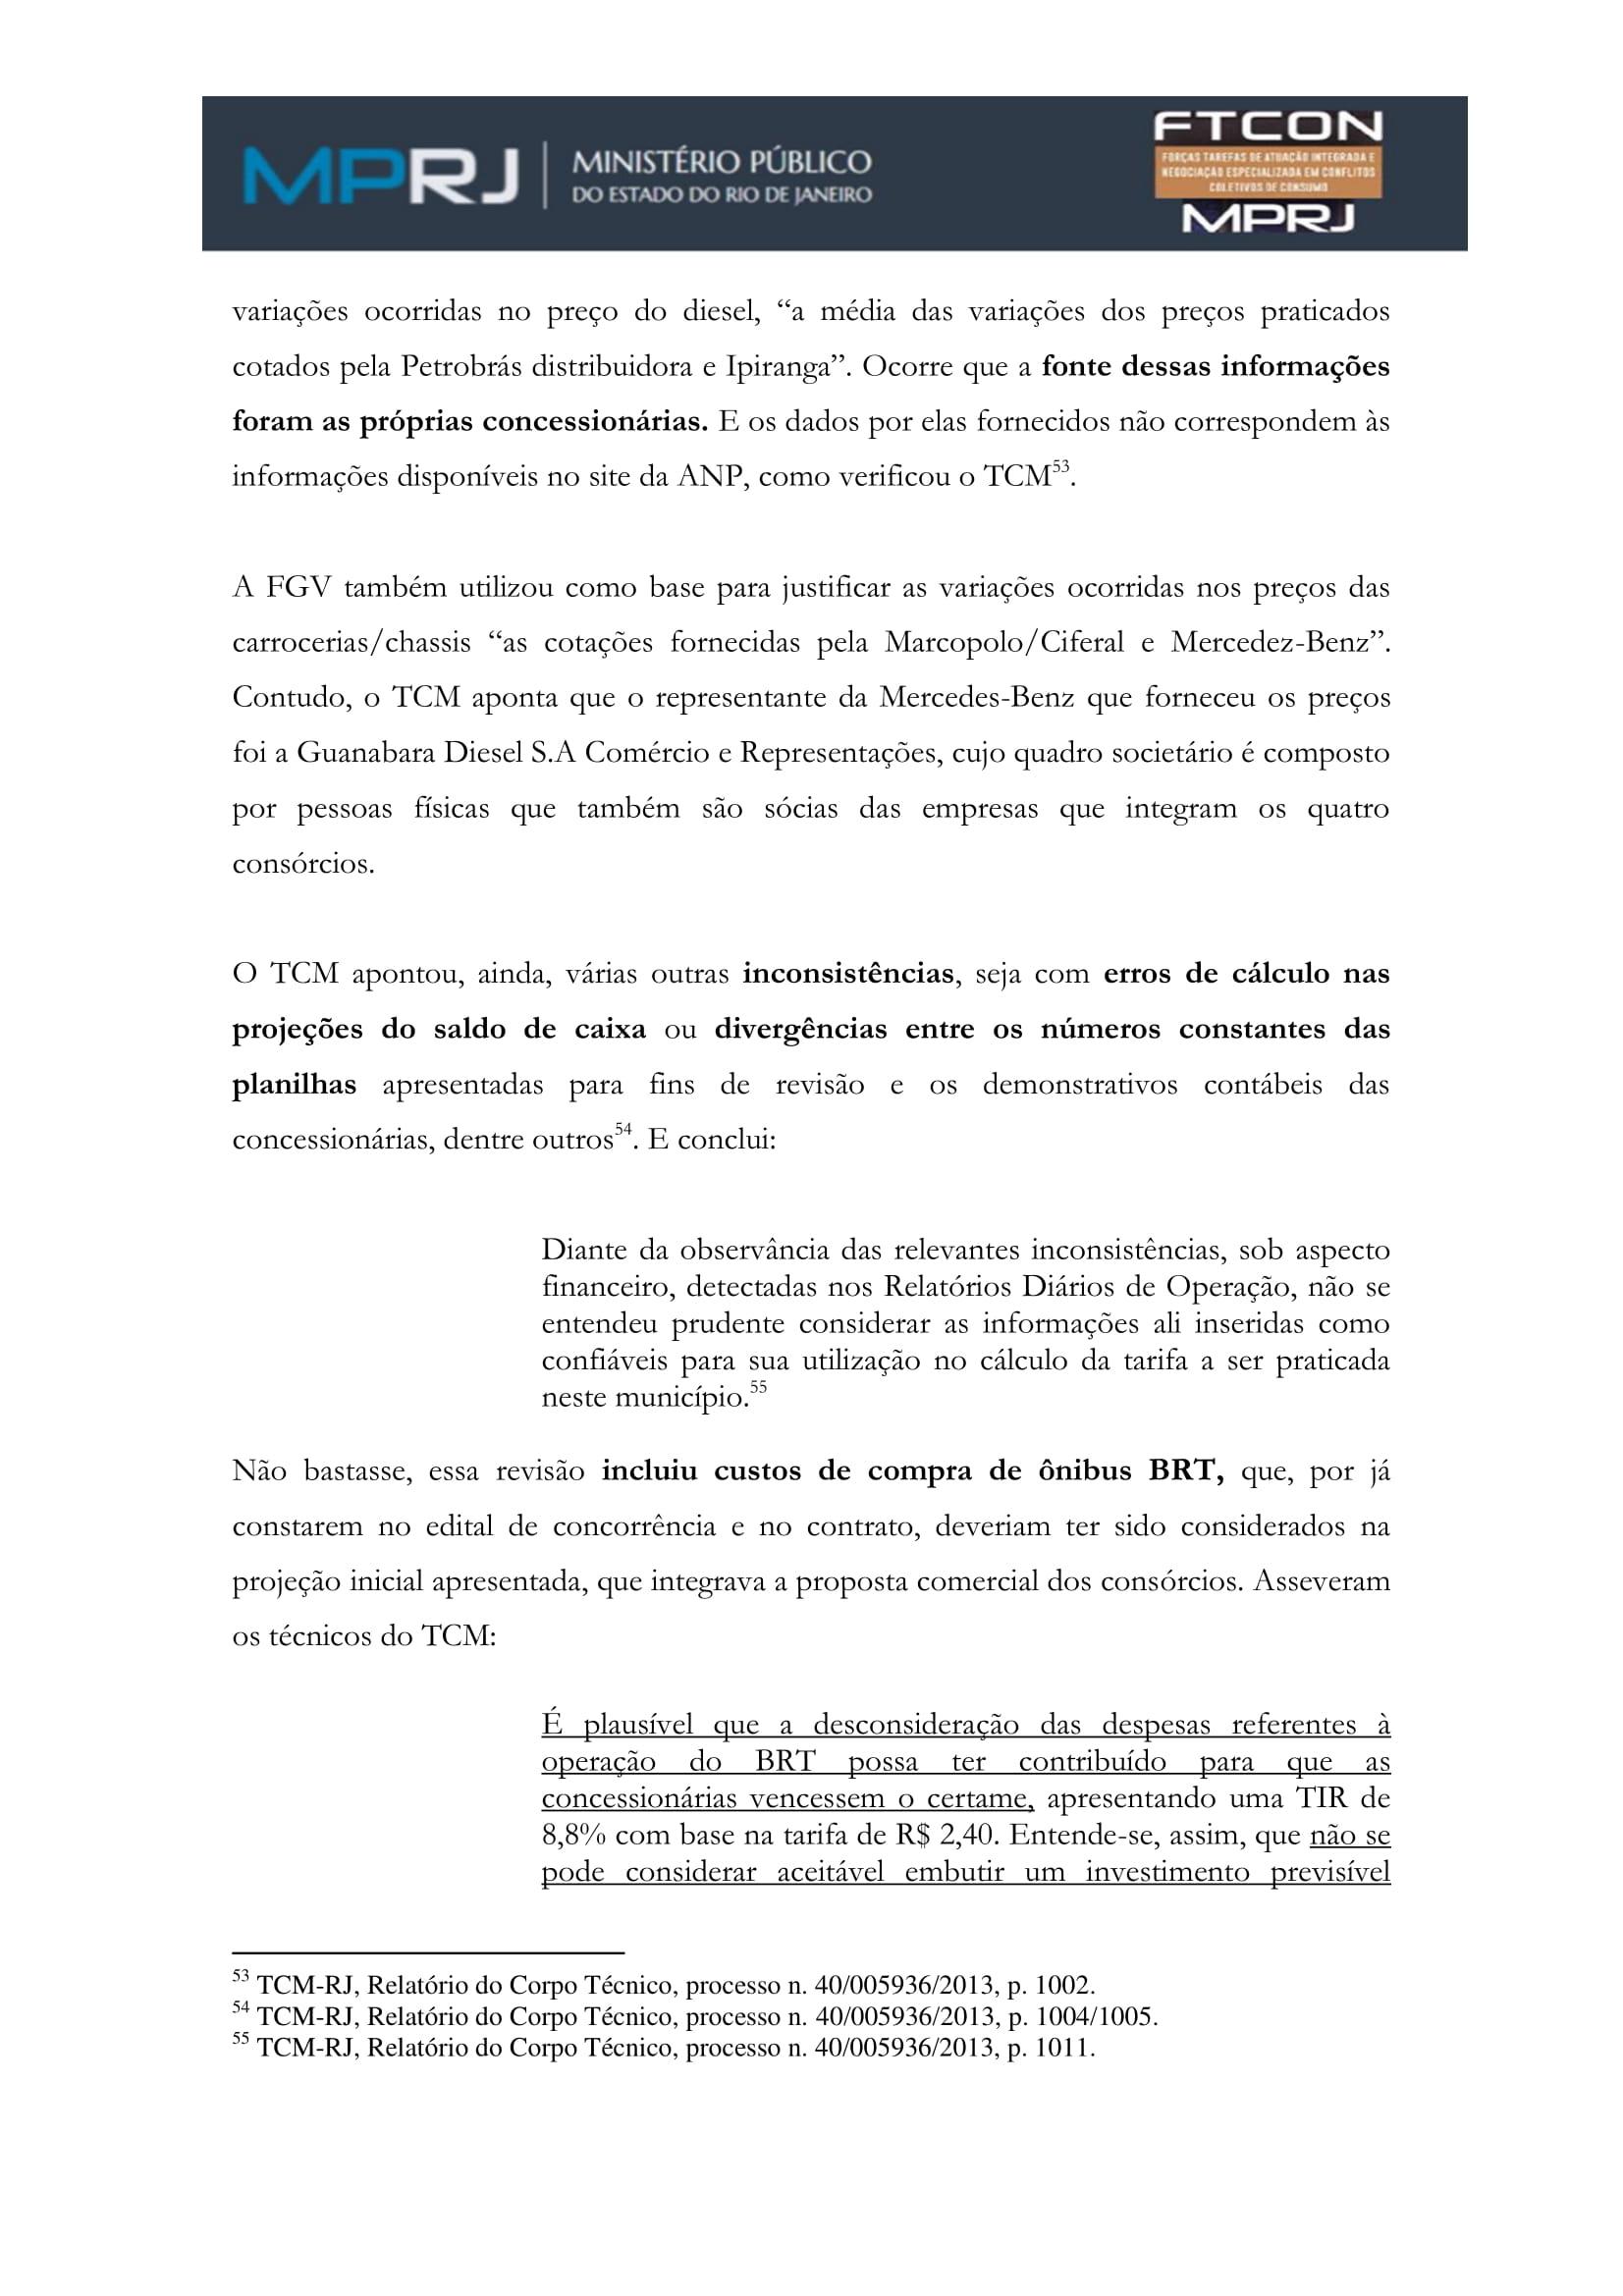 acp_caducidade_onibus_dr_rt-071